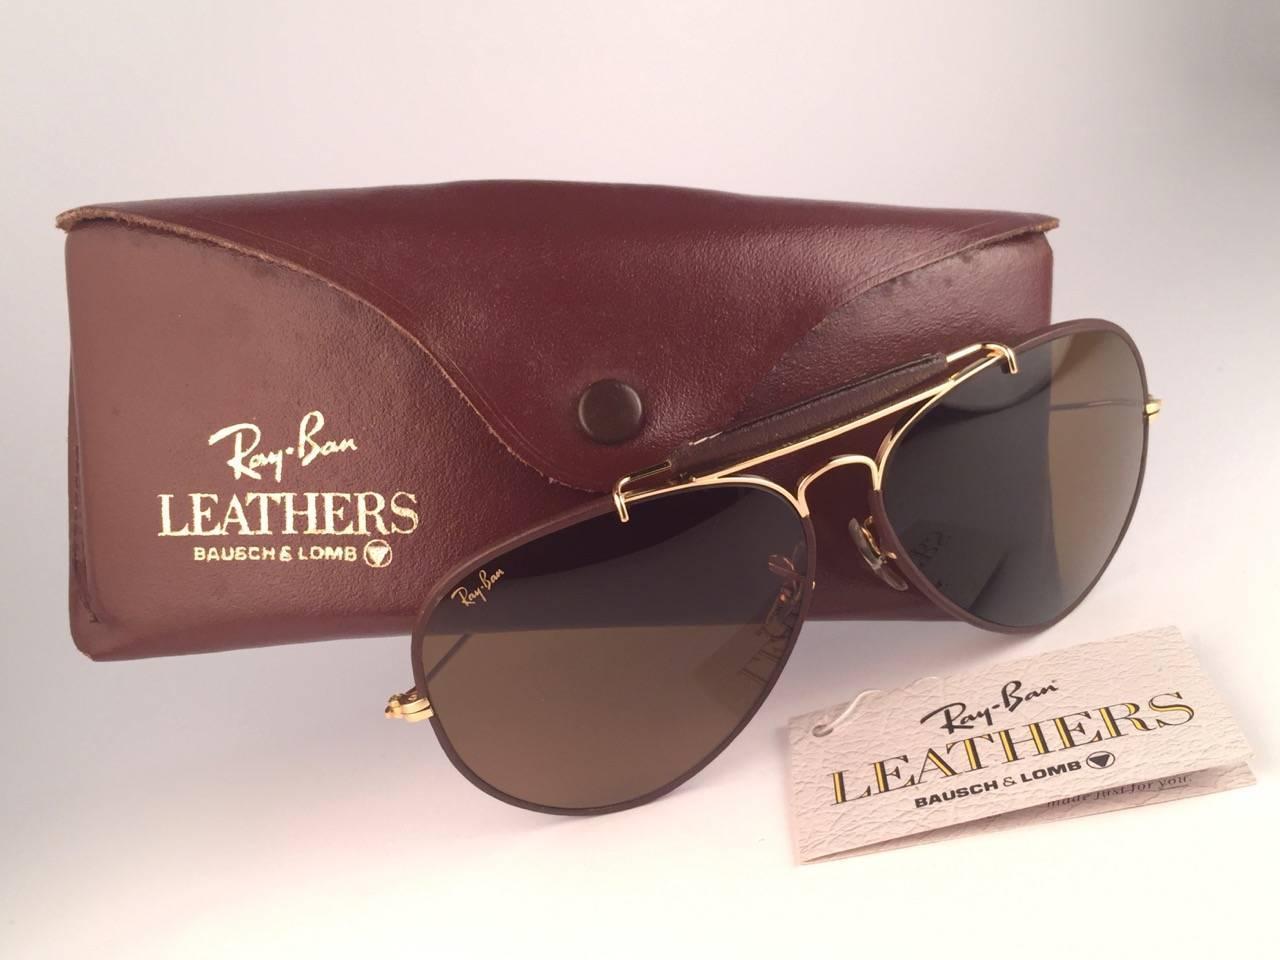 f4c53db935 New Ray Ban Leathers Brown Outdoorsman 62Mm B15 Lenses B L USA Sunglasses  at 1stdibs